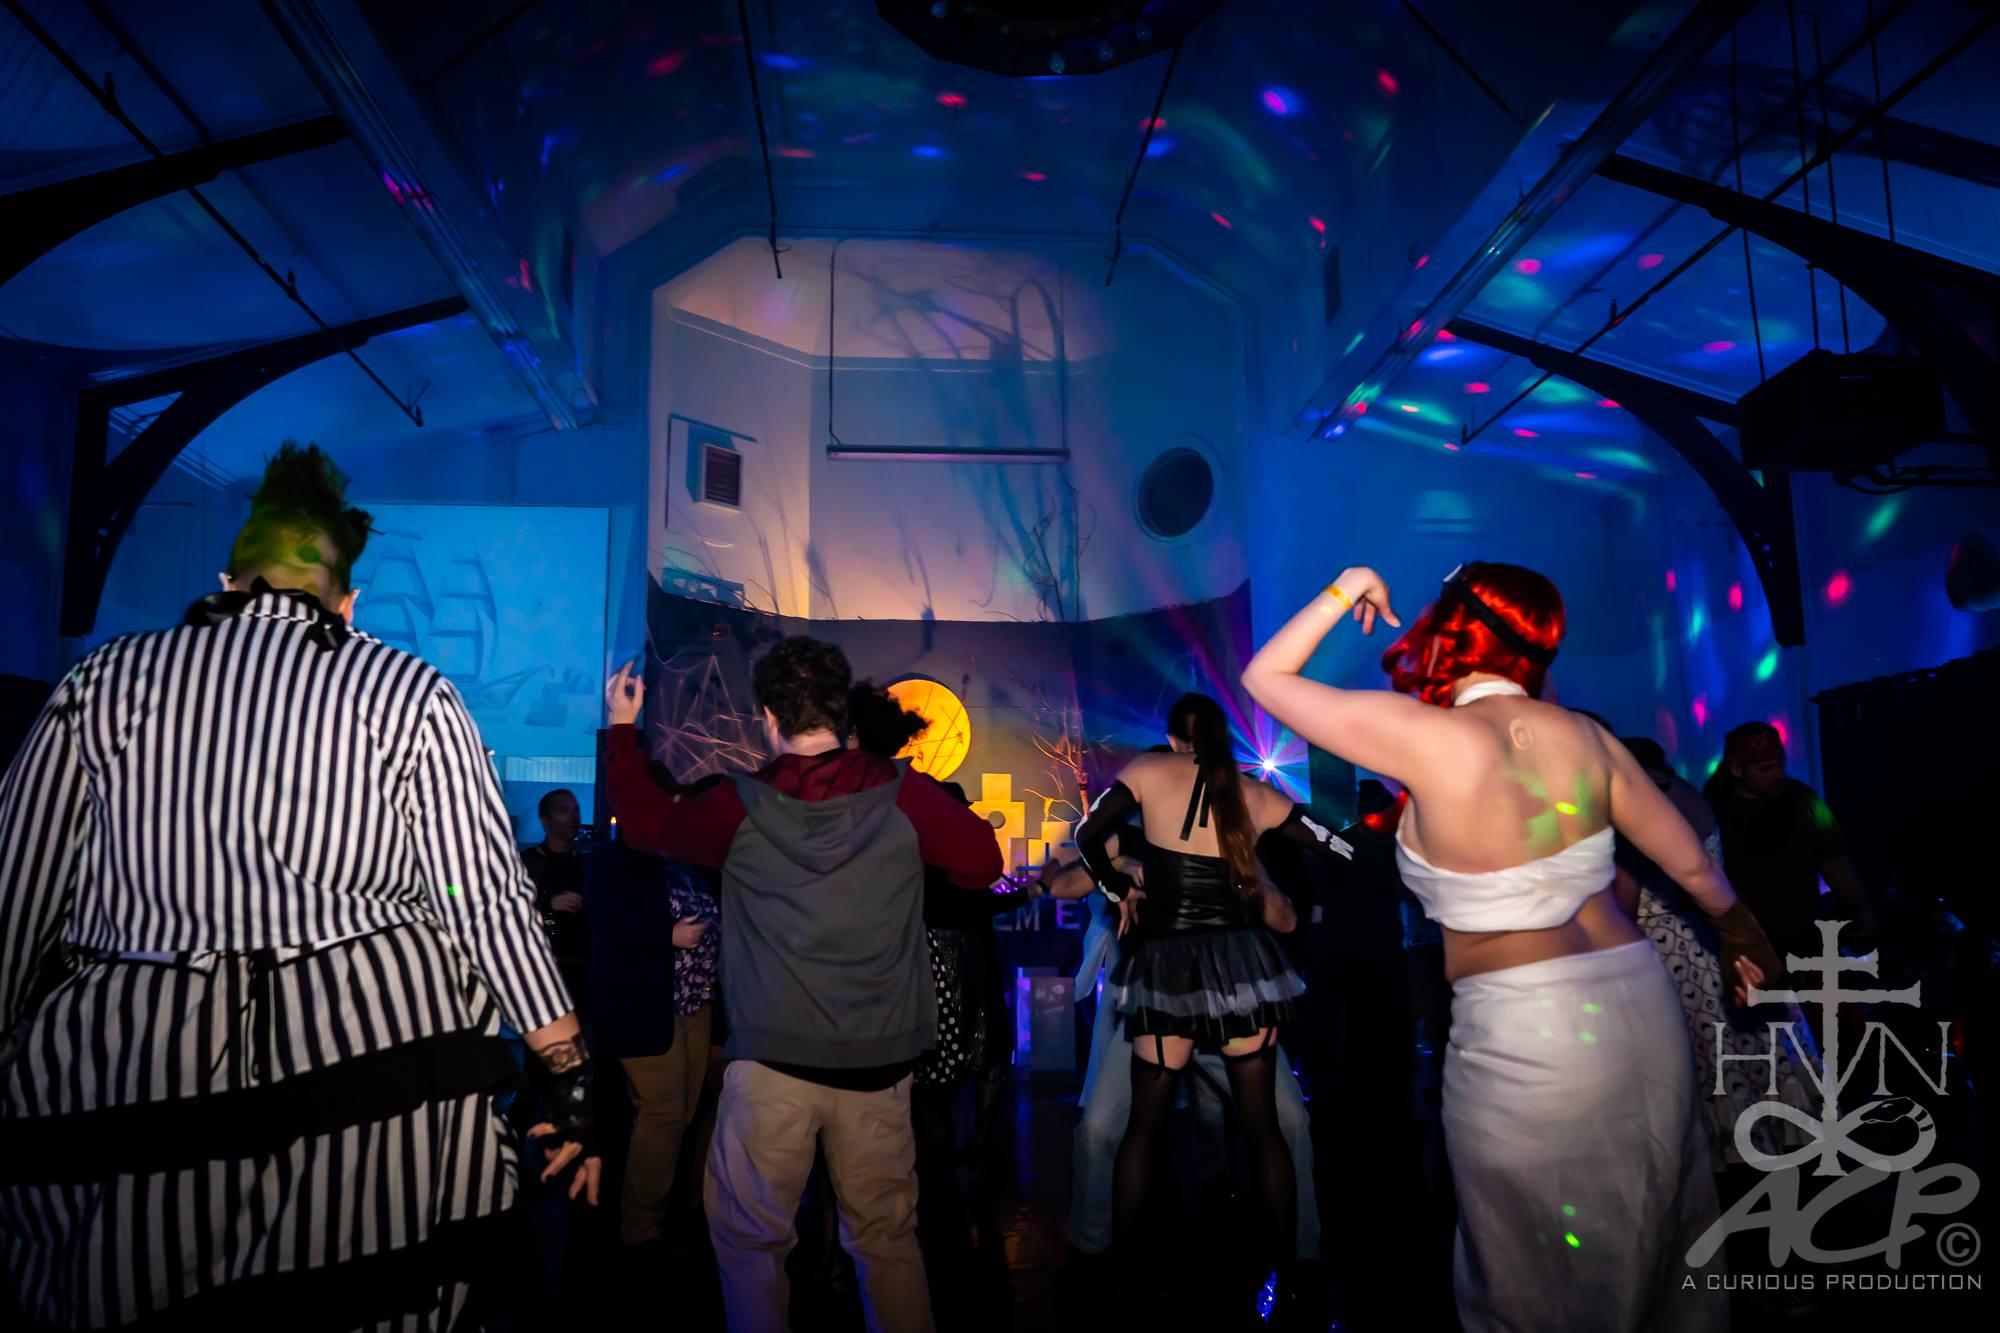 TheHavenClub-Goth-Industrial-Dance-Alternative-Northampton-MA -Halloween 2018 (61).jpg